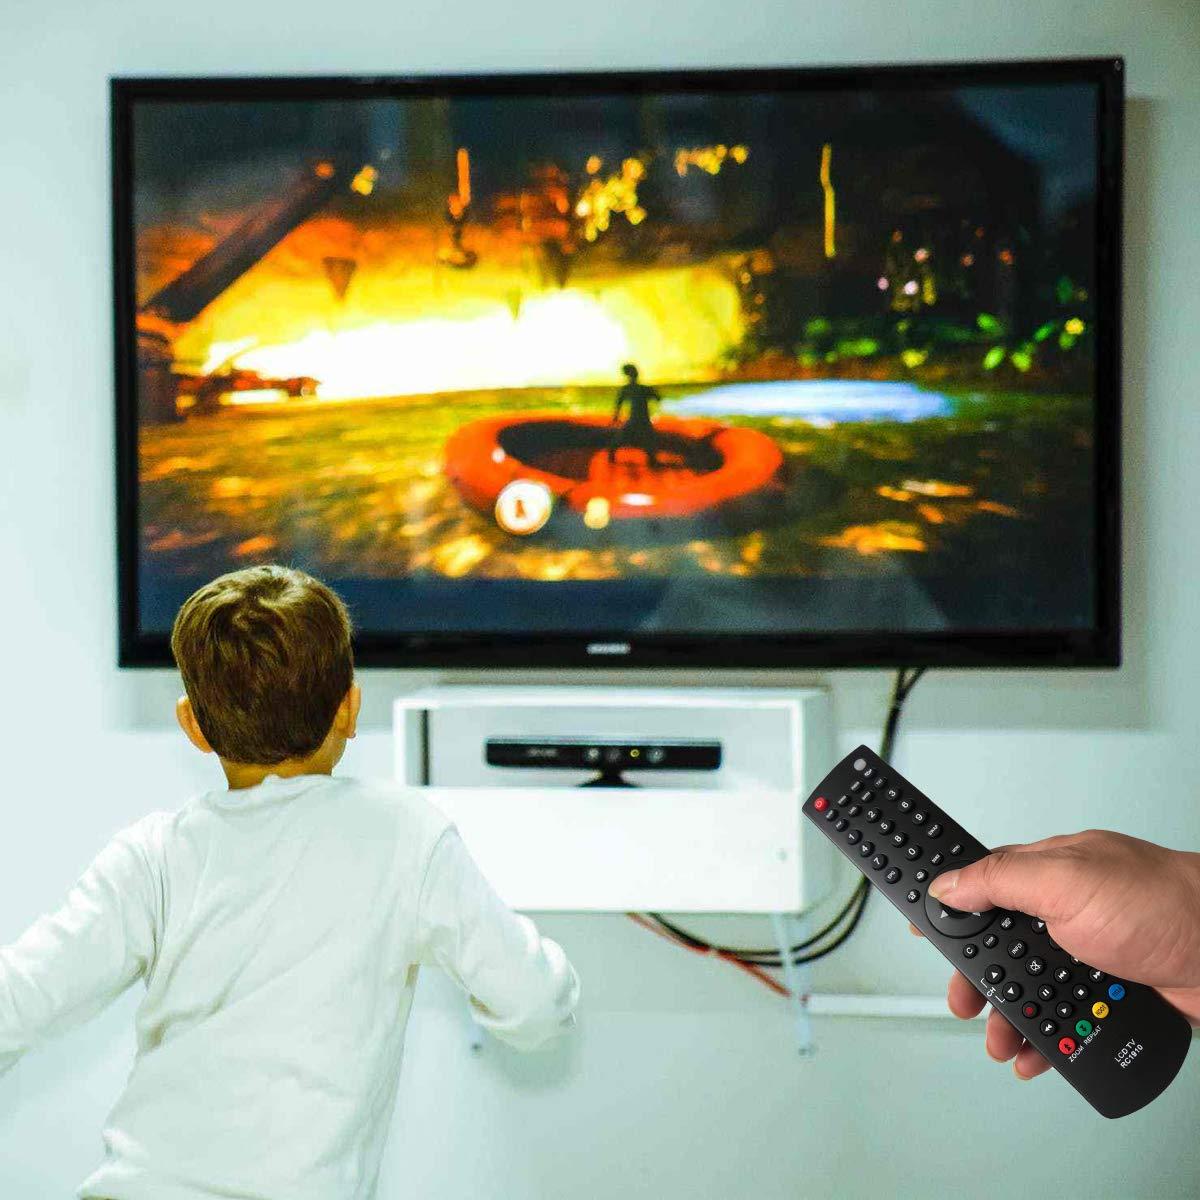 EAESE RC1910 Reemplazo Mando a Distancia para Toshiba Sharp Polaroid TVs Control Remoto RC-1910 22DL704B 22L1333B 22L1337DB 24W1337DB 32D1333B 32D1334B 32DV502B 3 32W1334DB 32W1337DB 40L1337DB: Amazon.es: Electrónica